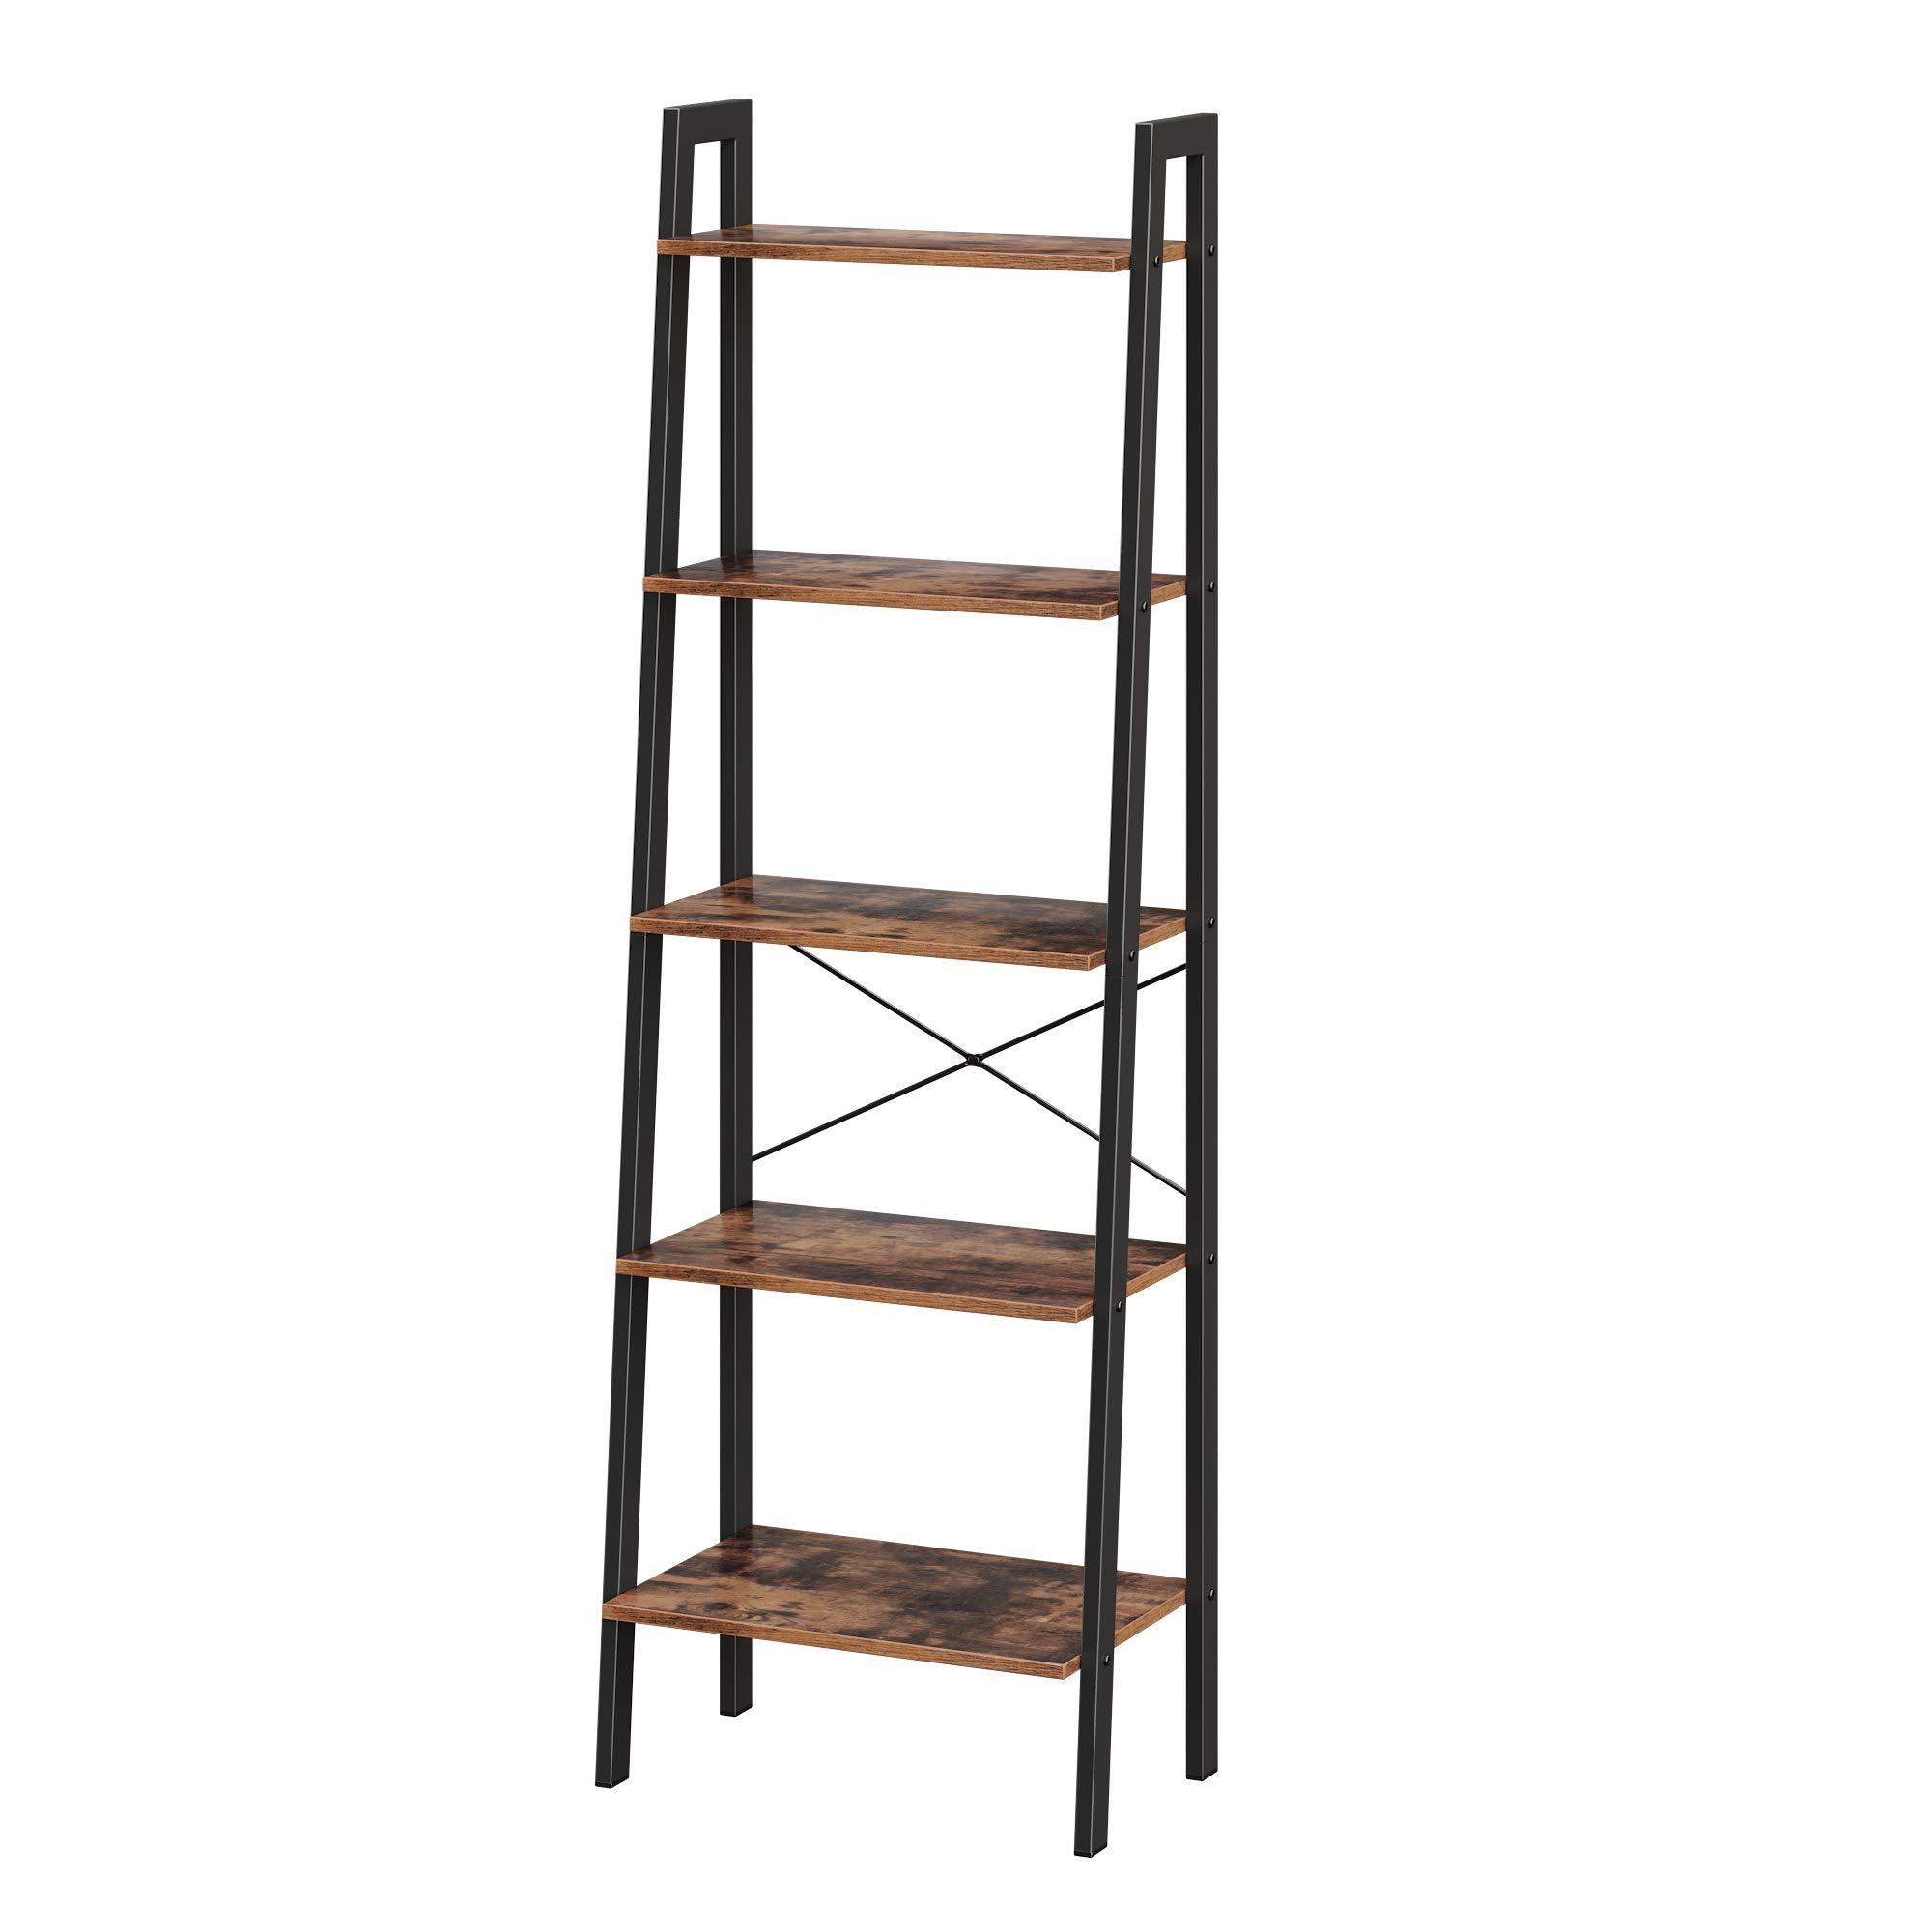 VASAGLE Ladder Shelf, 5-Tier Industrial Bookcase, Storage Unit, with Metal Frame, for Living Room, Kitchen, Rustic Brown LLS45X